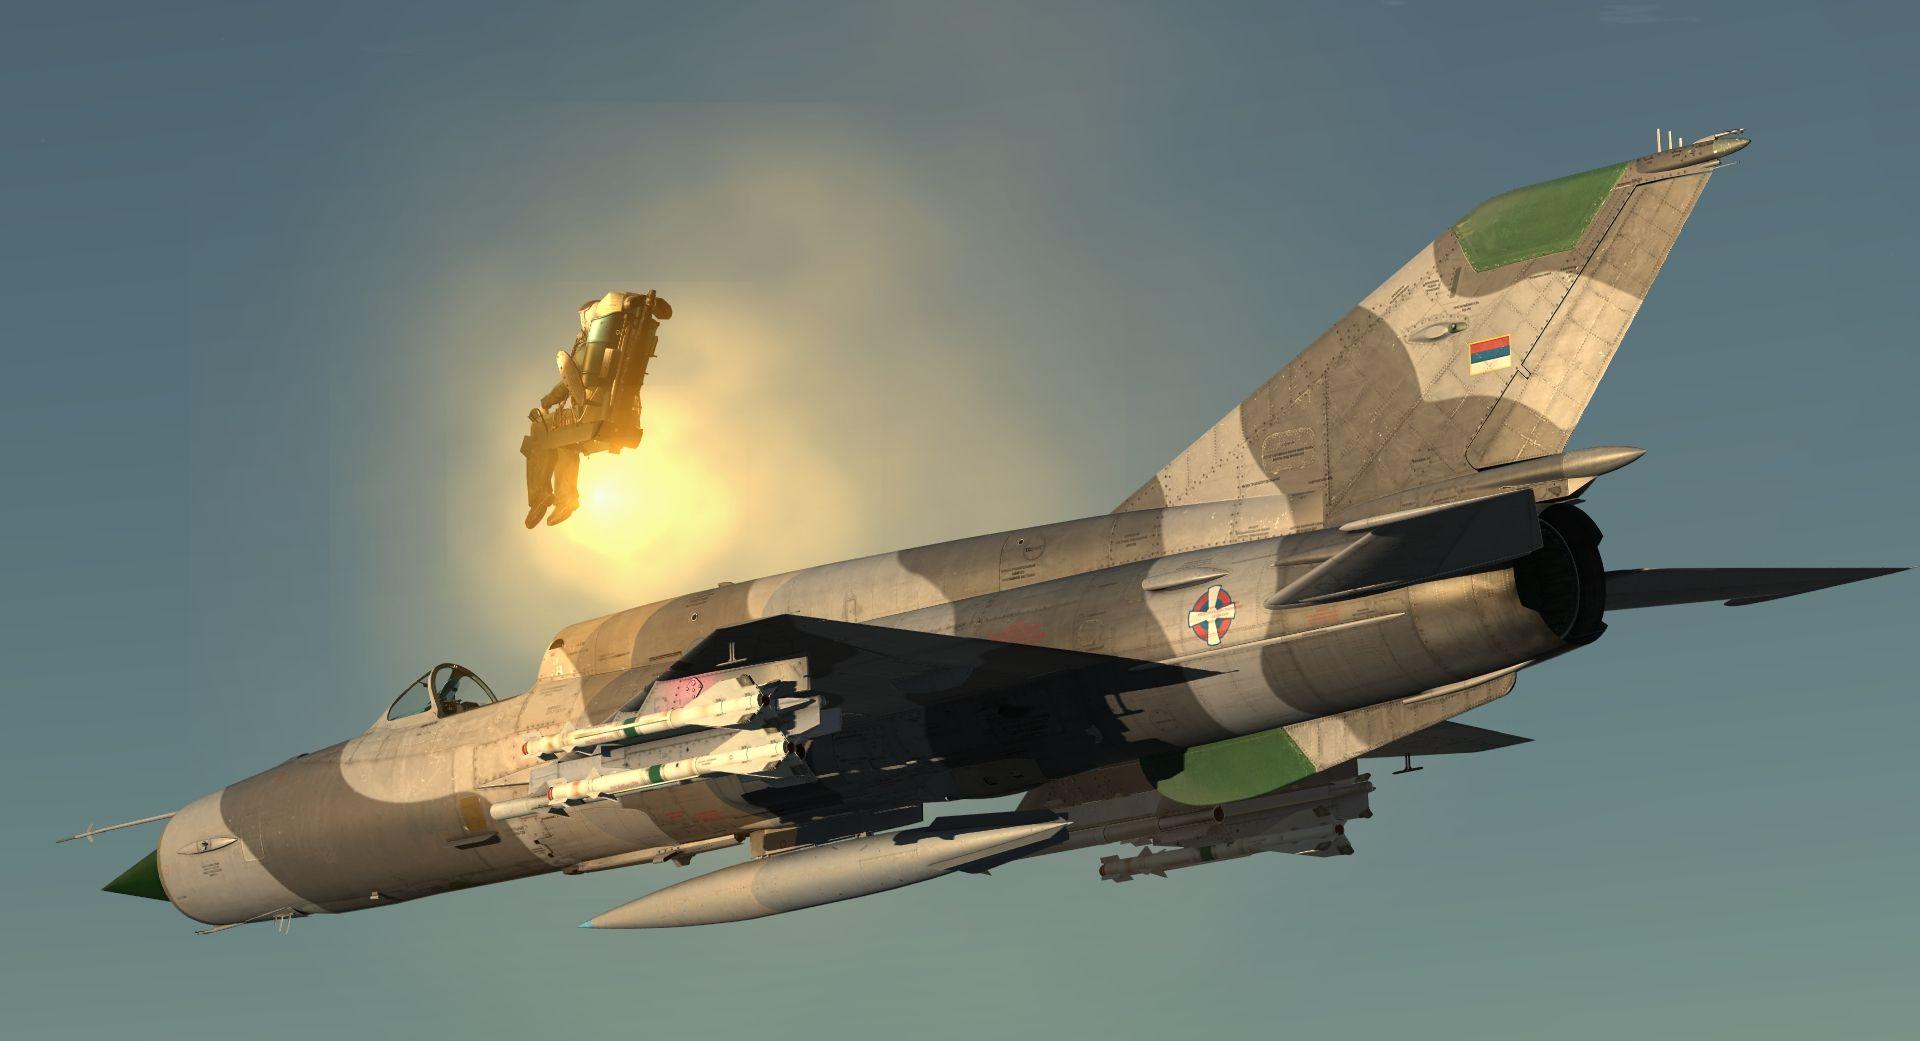 MiG-21 pilot ejection (DCS World) | Aviation | Mig 21